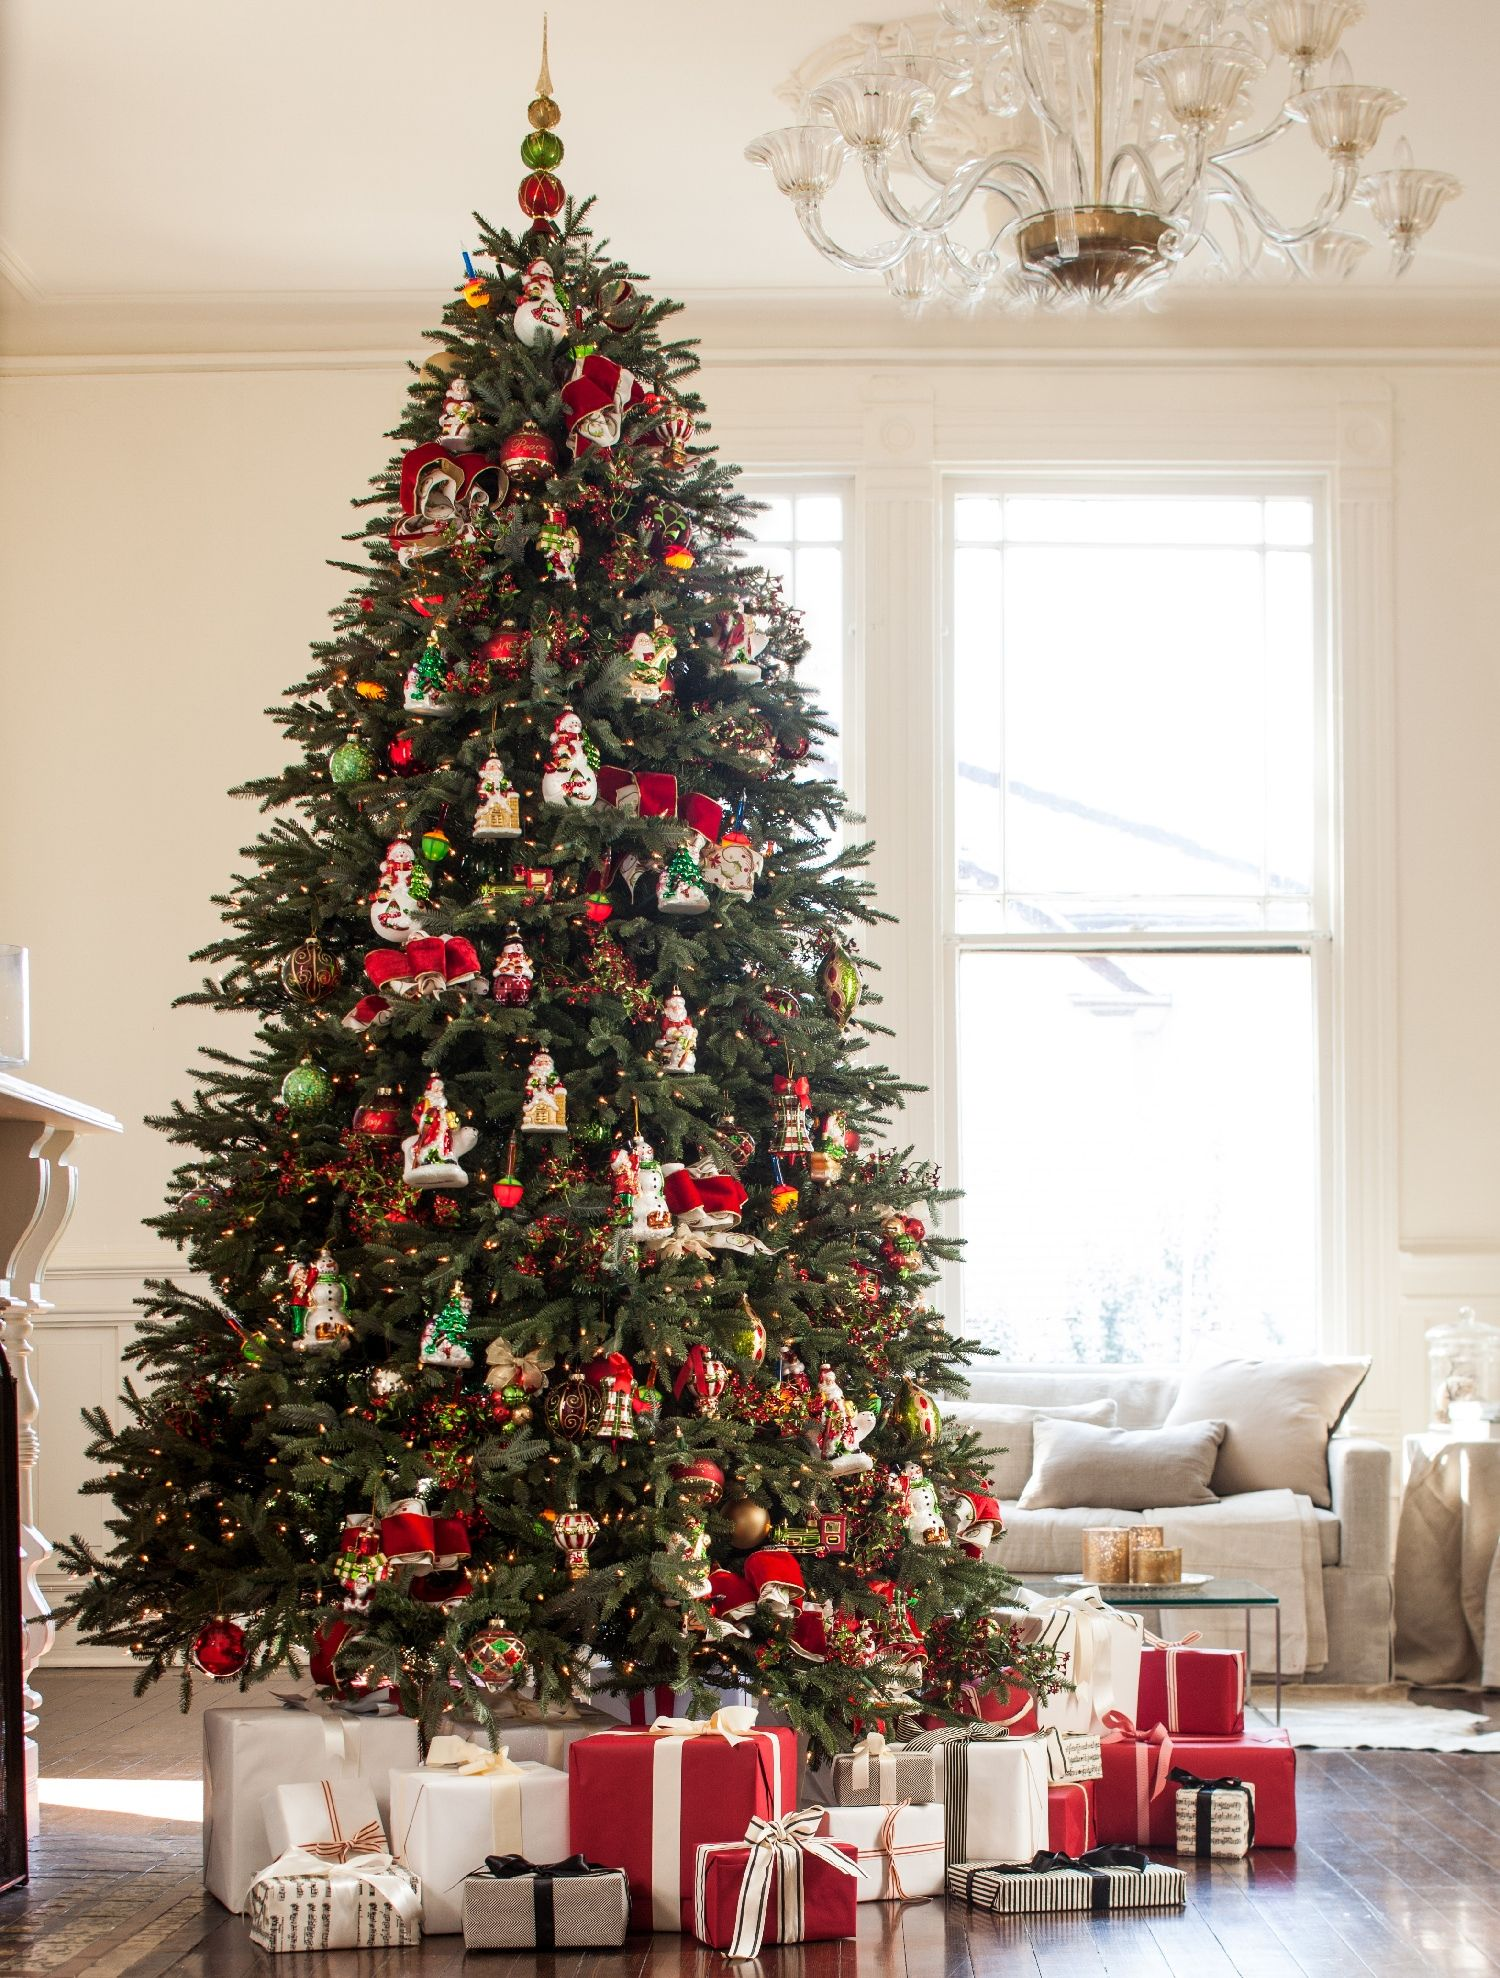 Bh Fraser Fir Tree Christmas Tree Big Christmas Tree Christmas Tree Decorations